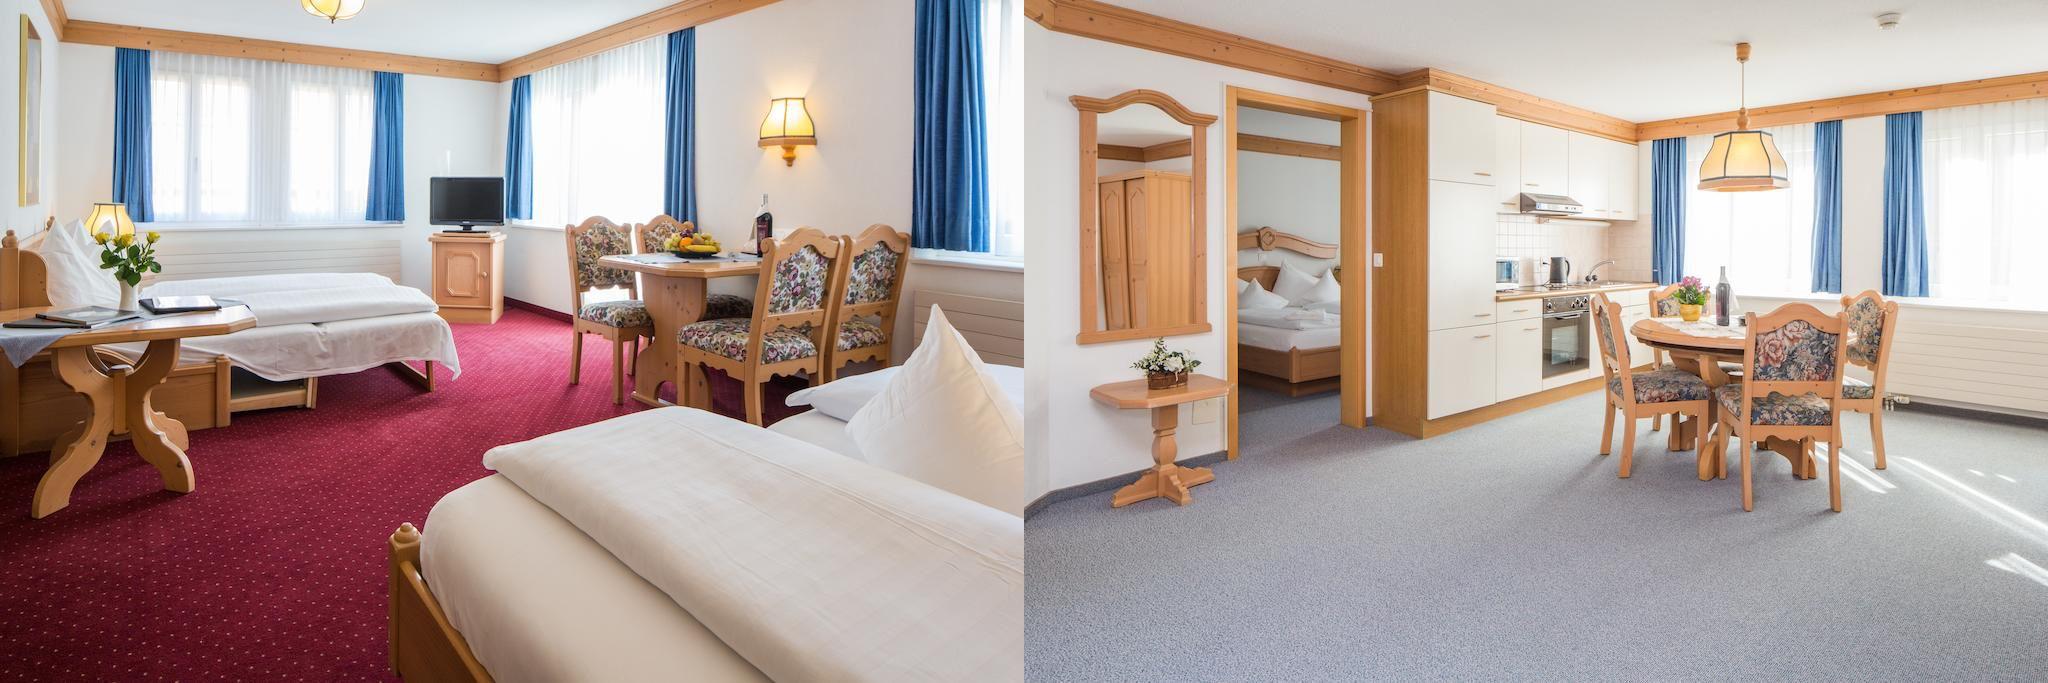 Hotel Grindelwalderhof, 格林德瓦飯店, 瑞士飯店, Grindelwald Hotel